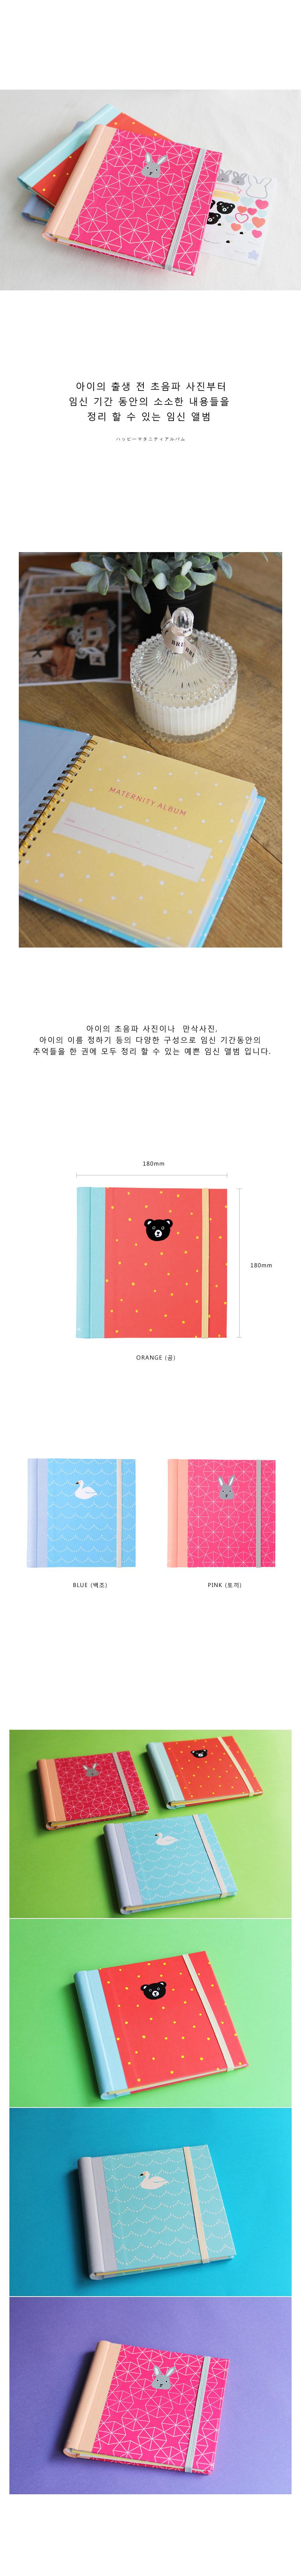 Maternity photo album 임신앨범-MOM-AL6 - 막스, 25,000원, 포트폴리오/테마북, 출산/베이비앨범